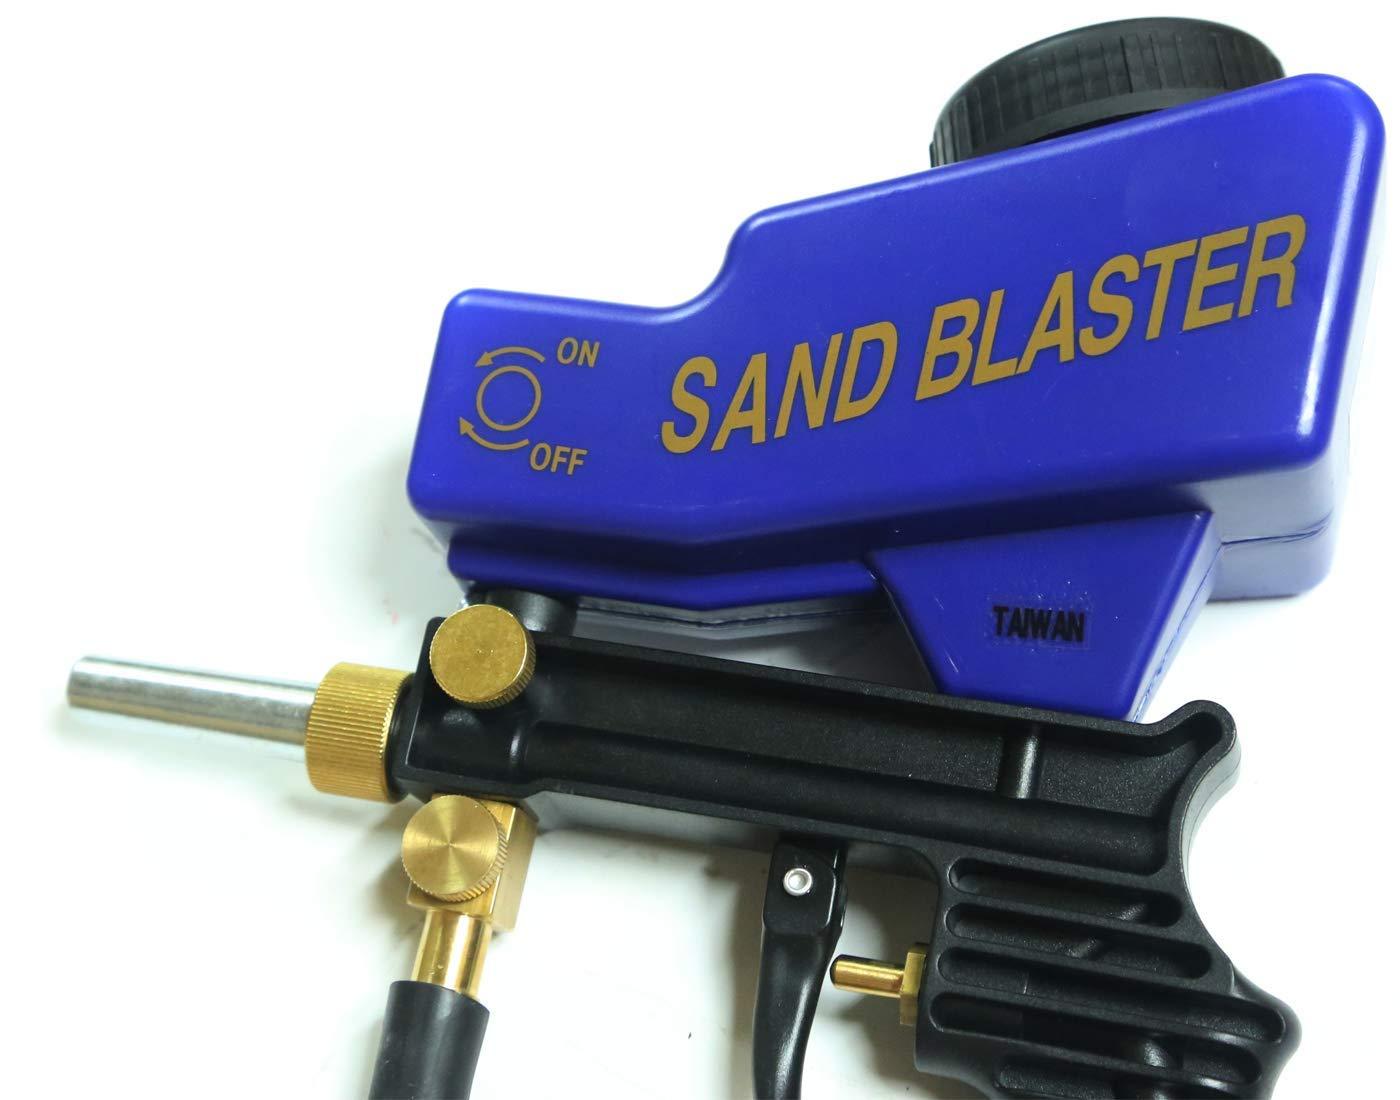 Improved Sandblaster Sand Blaster Gun Kit, Soda Blaster, Professional Sand Blasters, Media Sandblaster Gun, Spot Blaster, Media Blaster Sandblast Gun, Walnut, Bead, Sand Blast Blasting Equipment. (A by LE LEMATEC (Image #3)